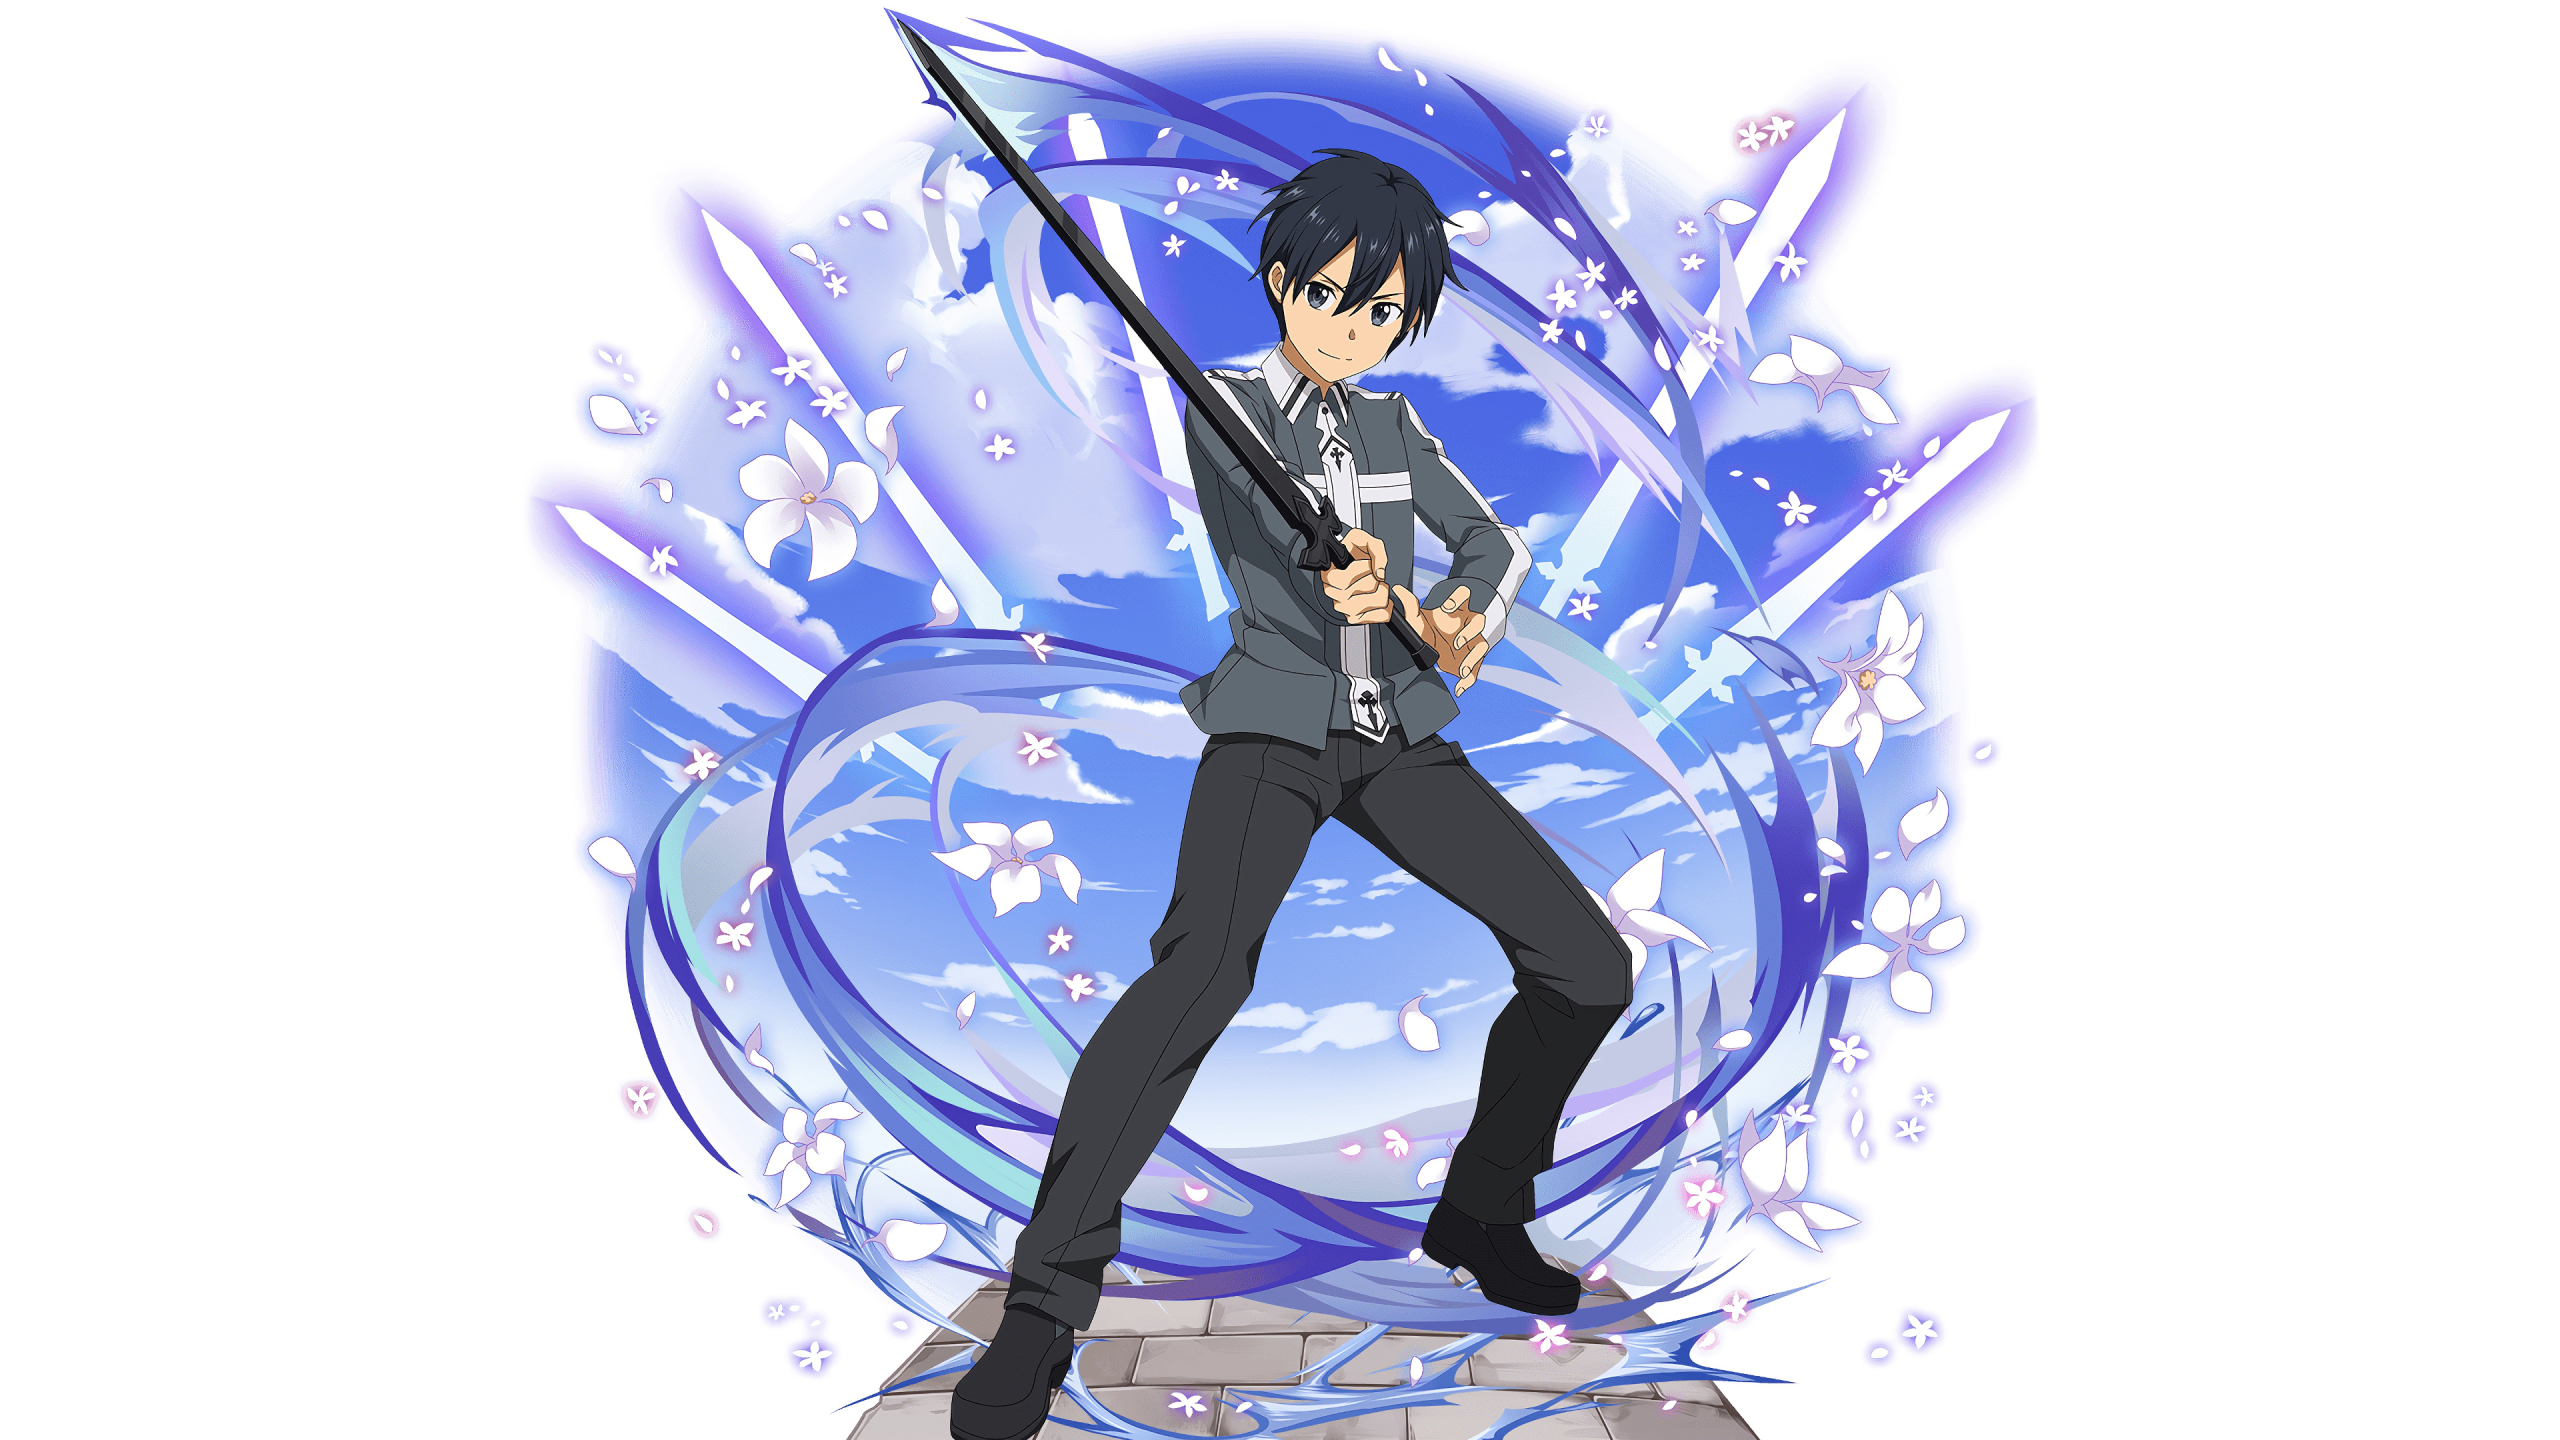 2560x1440 Kirito In Sword Art Online 1440p Resolution